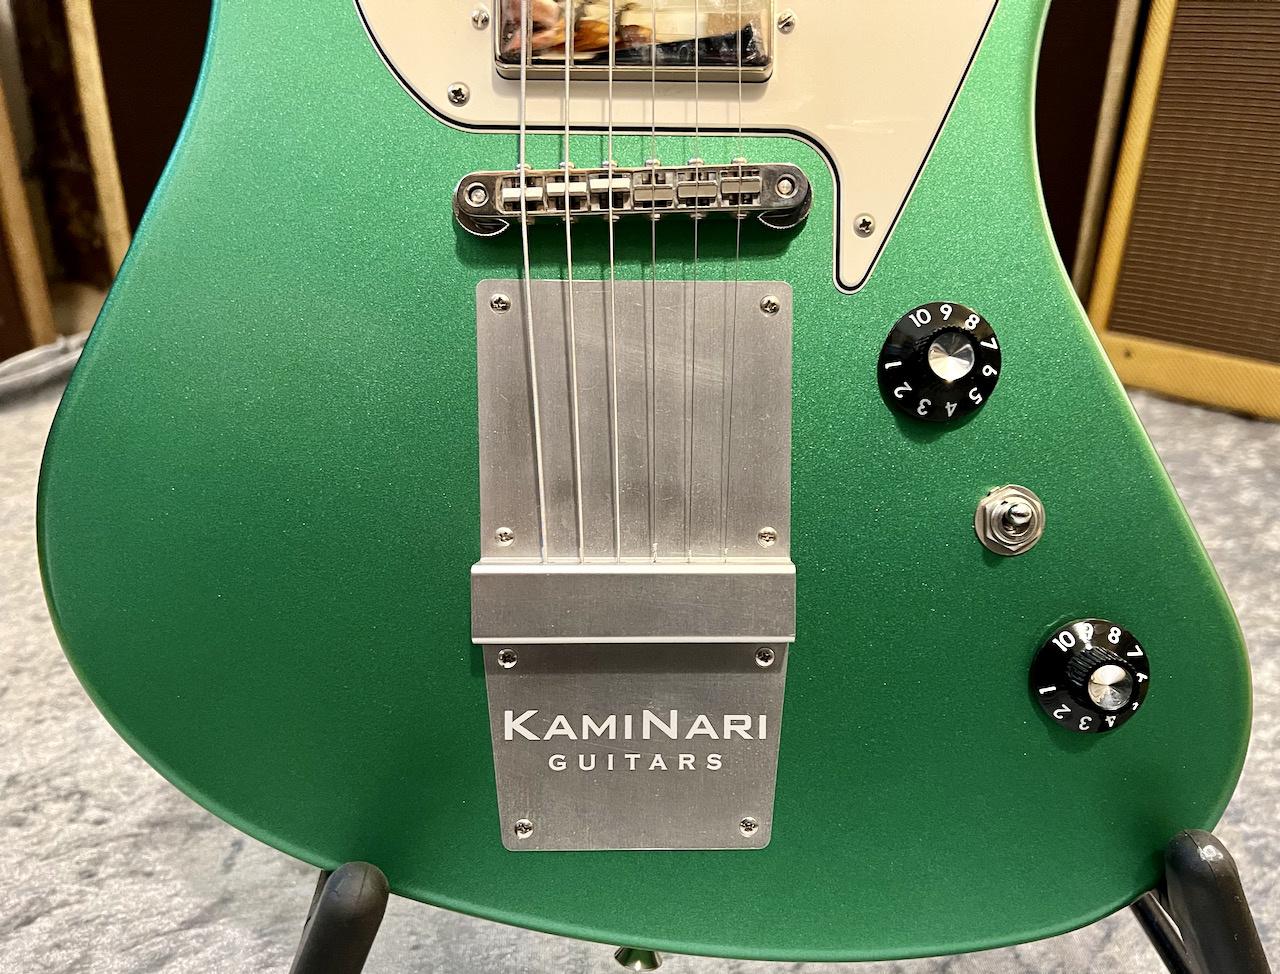 Kaminari Kaminari History Cygnet Incl. Gigbag Apple Green Metallic, DiMarzio Pups